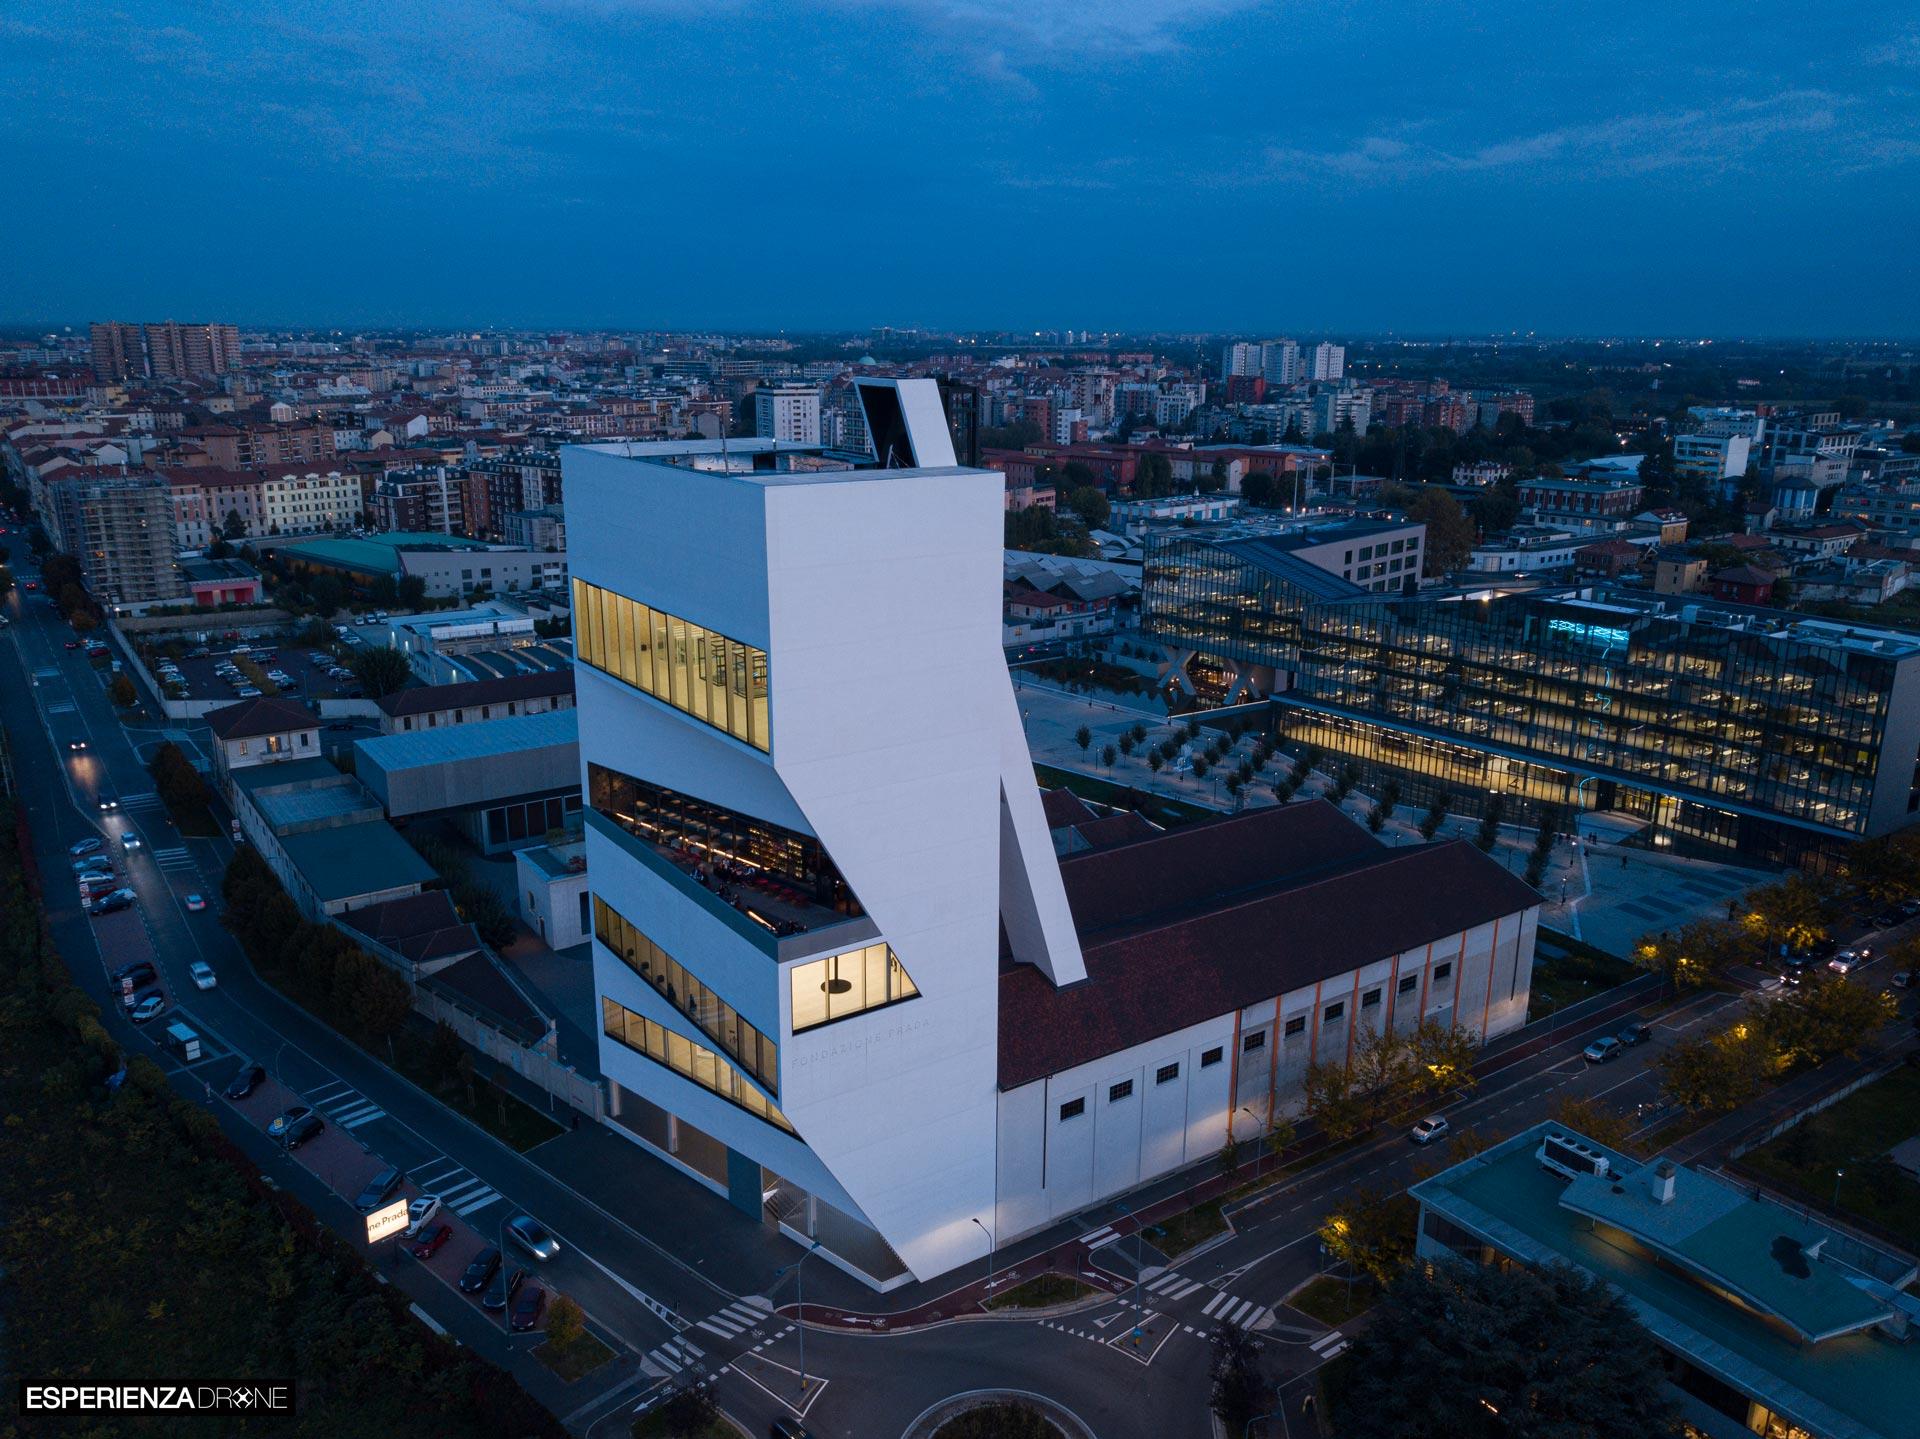 marco de bigontina pilota drone architettura torre prada ora_blu angolo.jpg